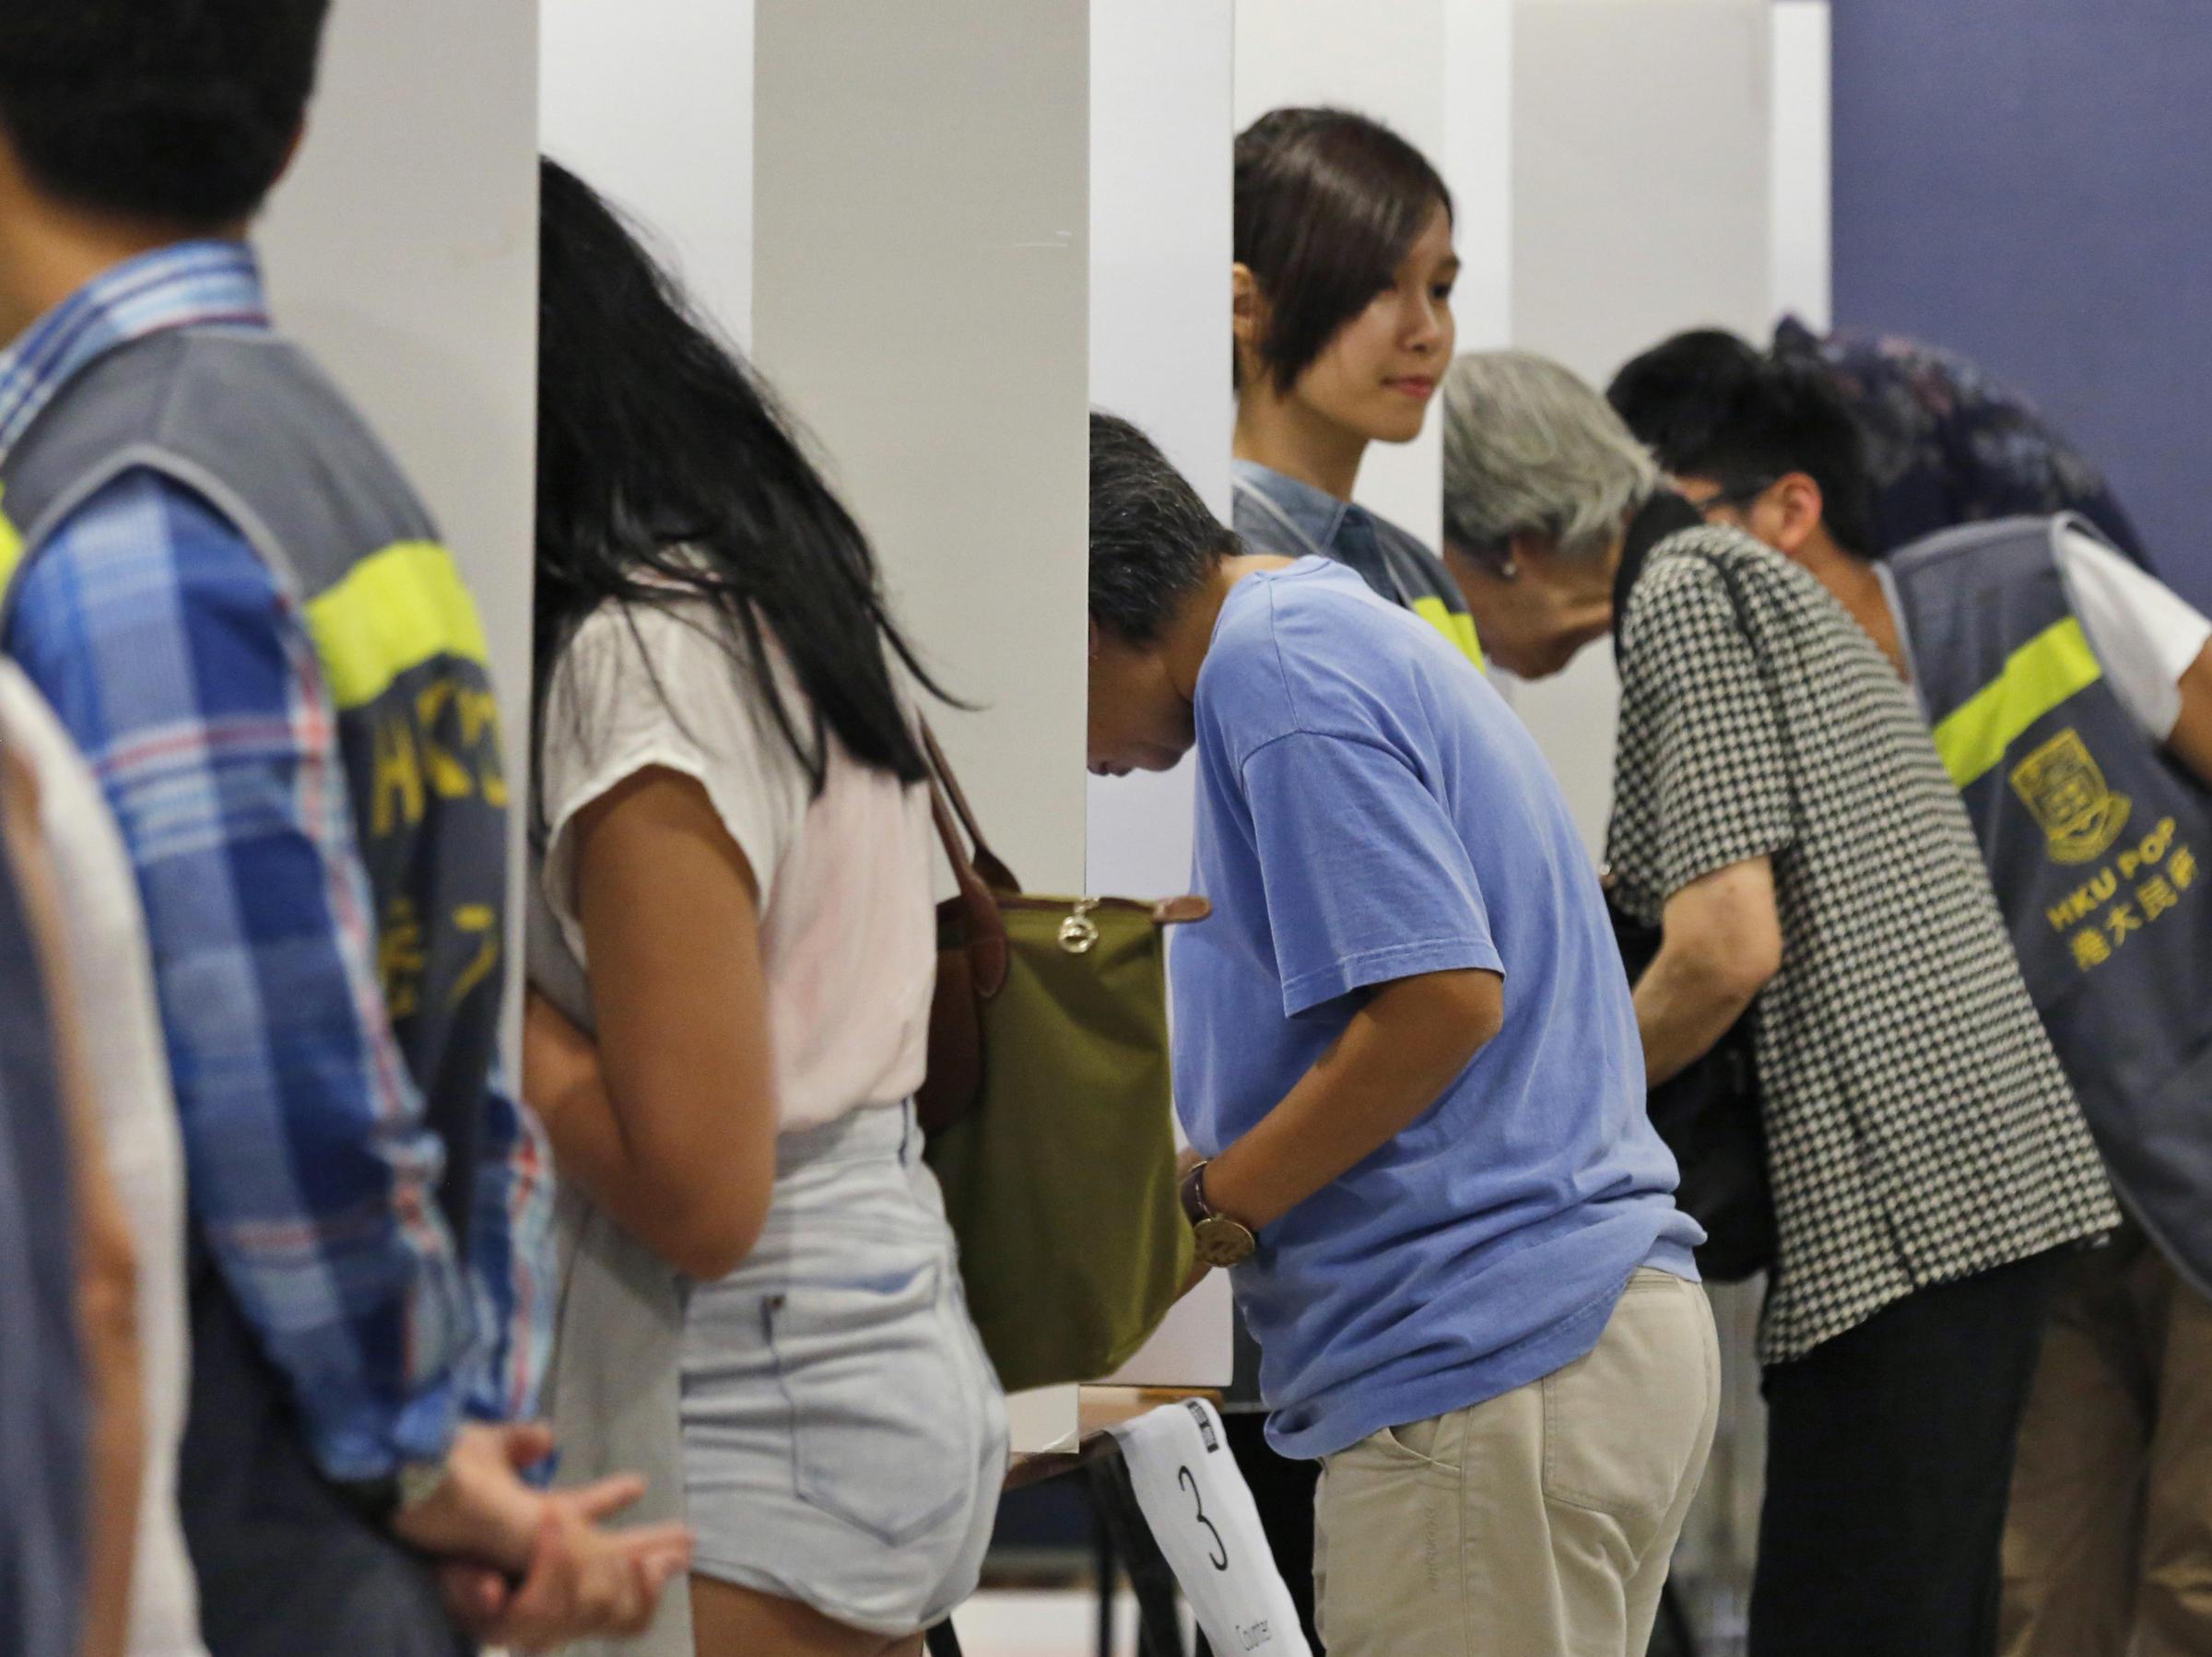 Beijing hong kong democracy referendum 39 an illegal farce for Farcical person